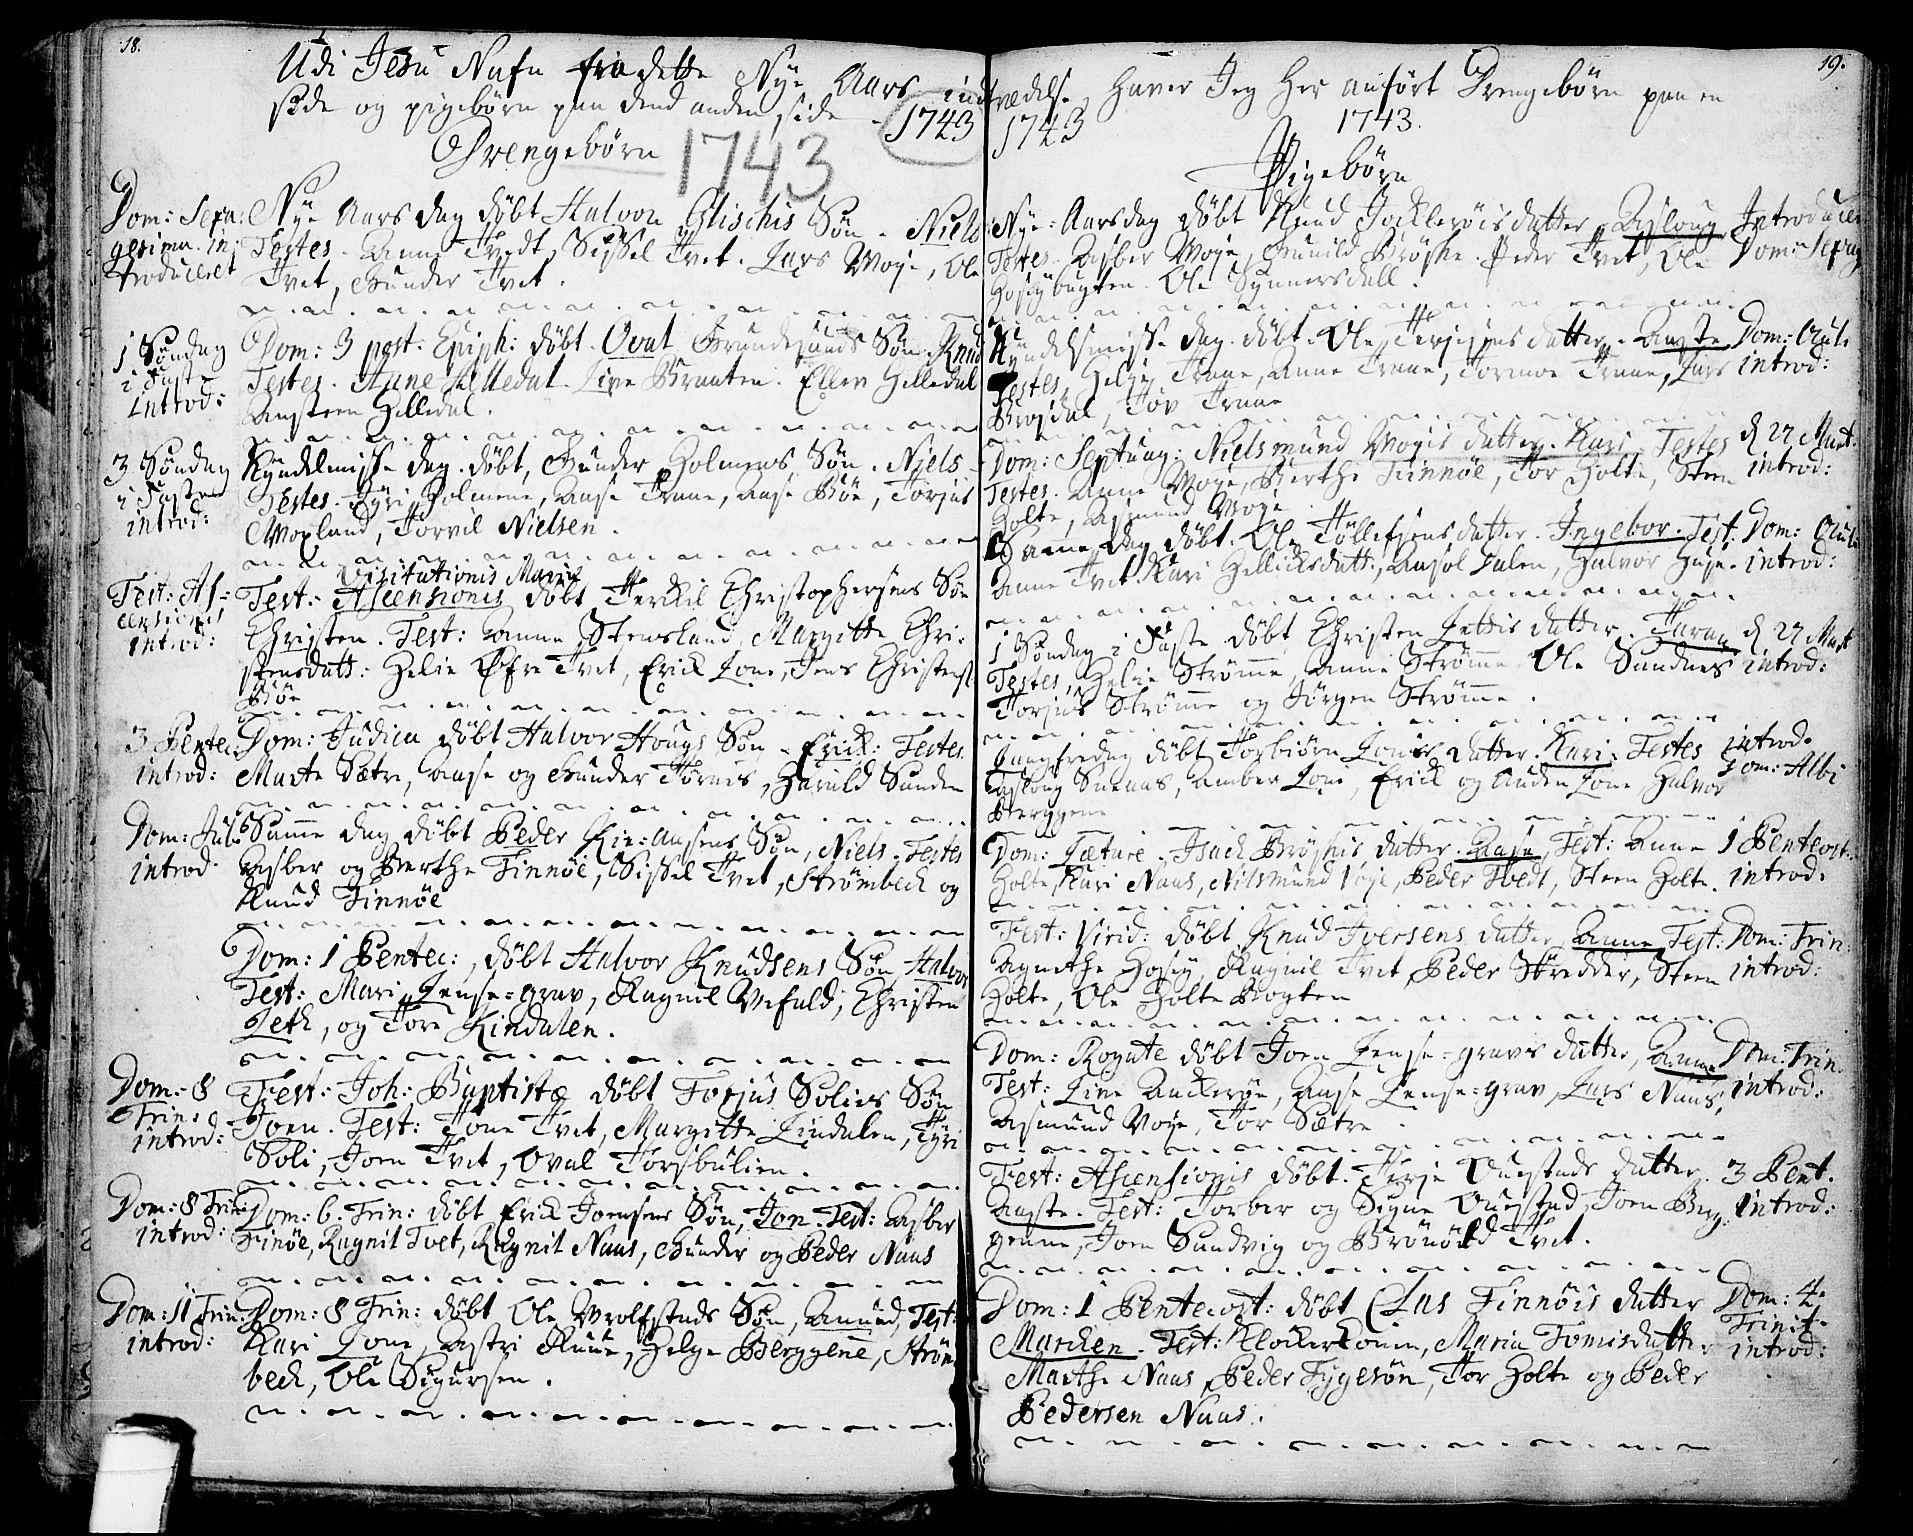 SAKO, Drangedal kirkebøker, F/Fa/L0001: Ministerialbok nr. 1, 1697-1767, s. 18-19